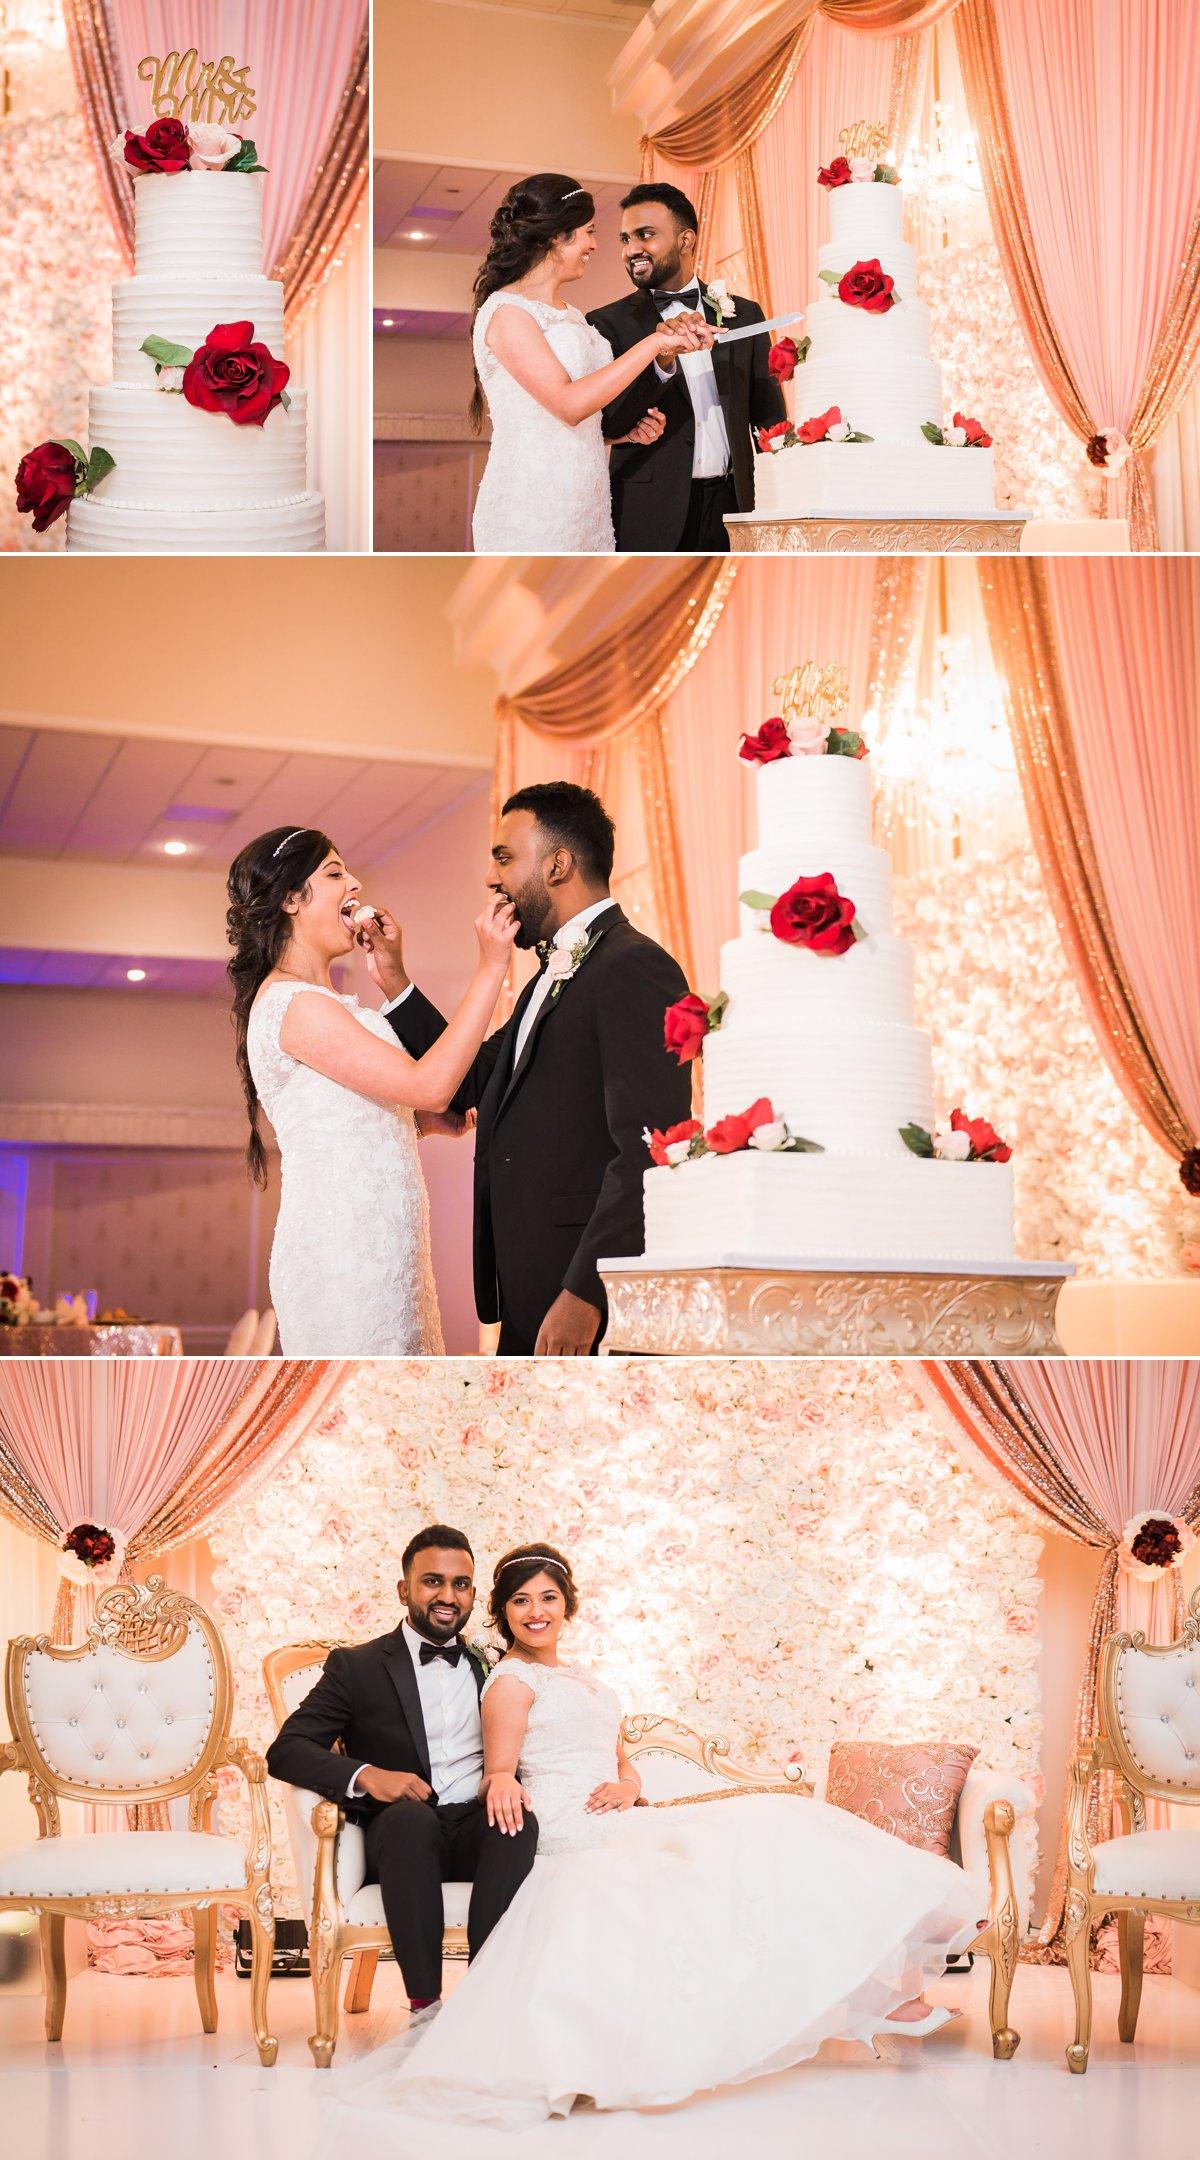 Grace-Allen Wedding Cake Photos by Nate Messarra